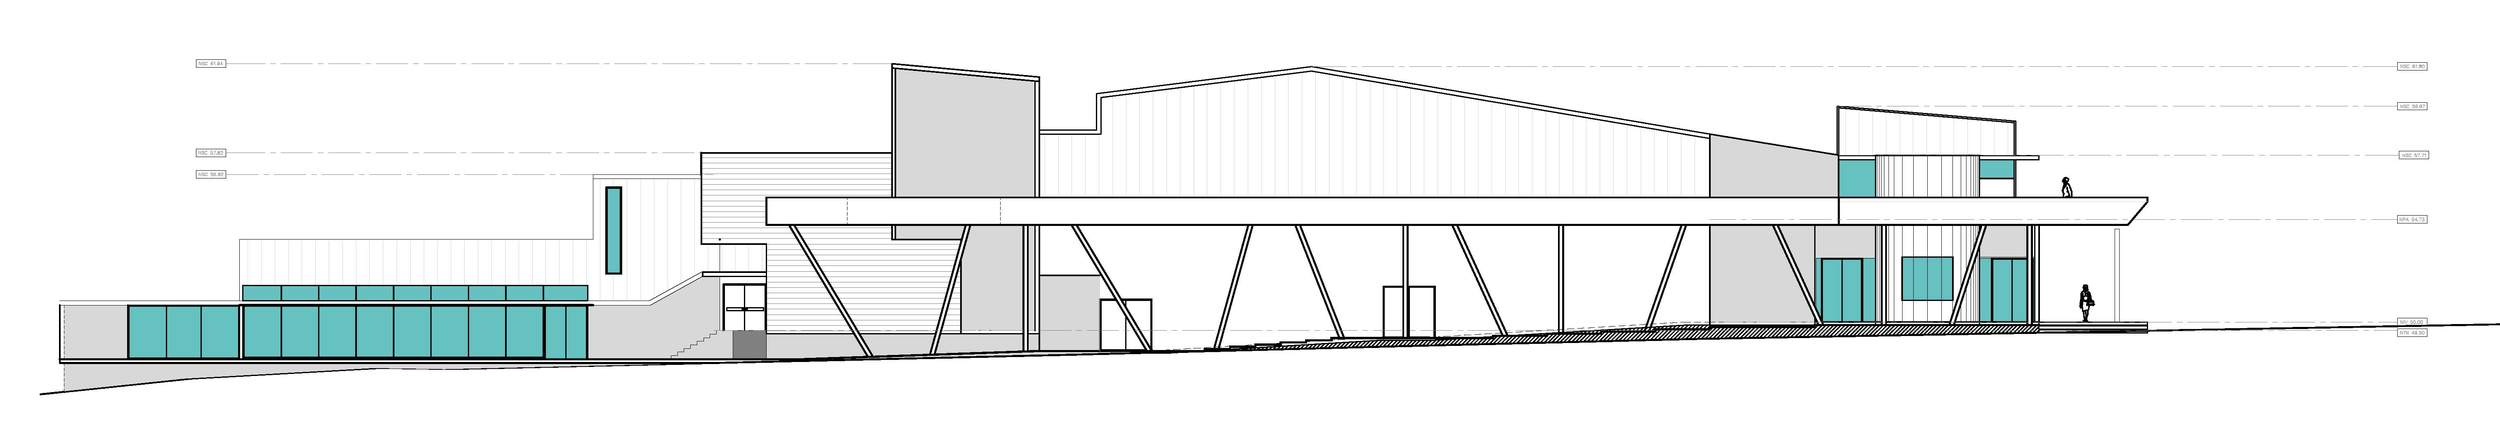 A04-ELEVACION LAT IZQ.jpg